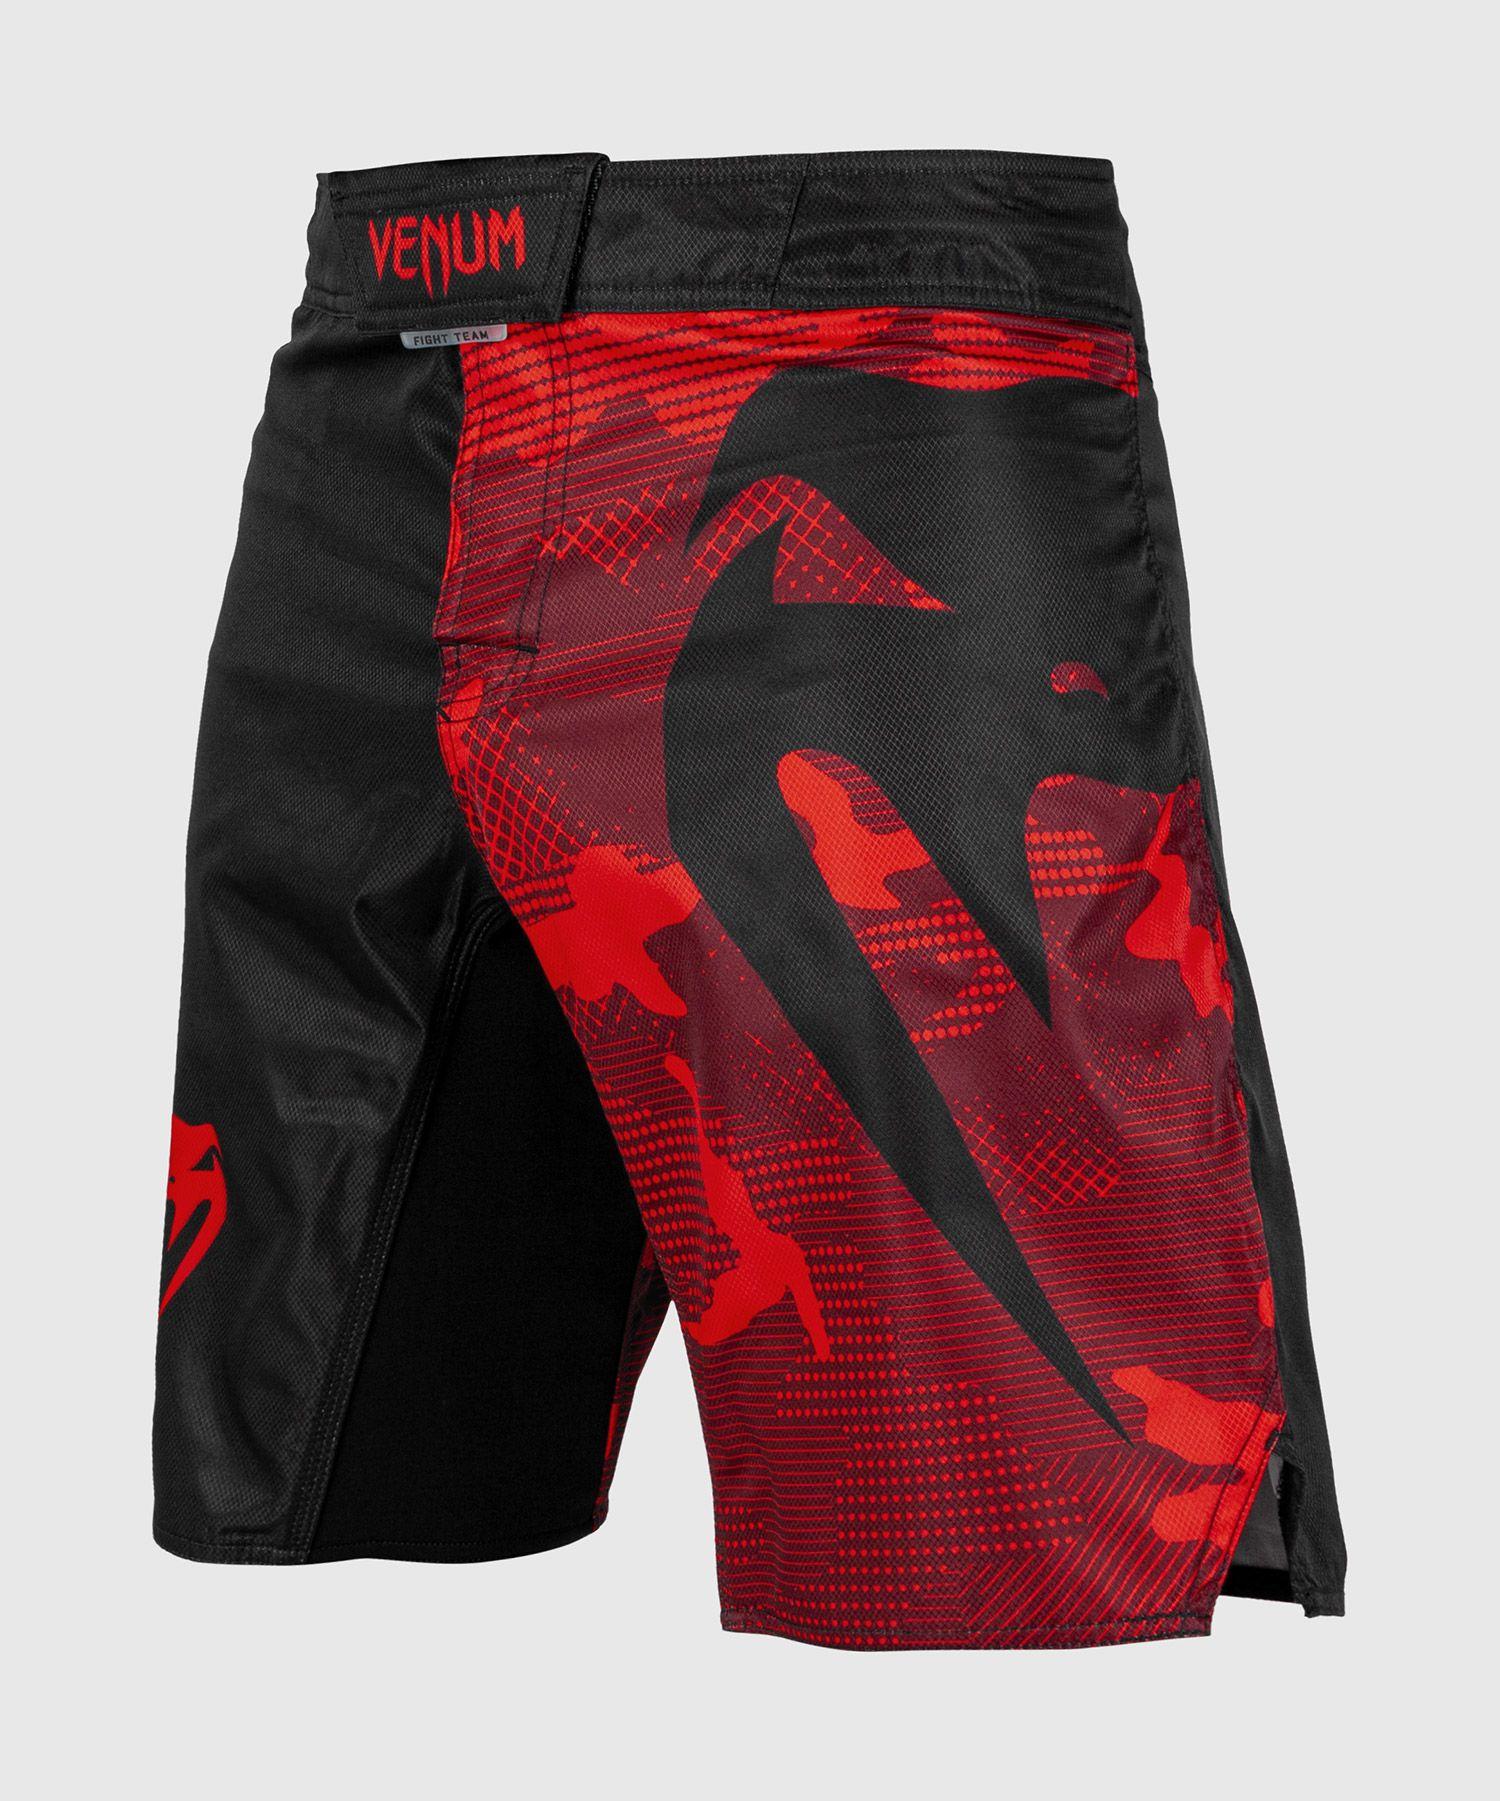 Venum Light 3.0 Vechtshort - Rood/Zwart